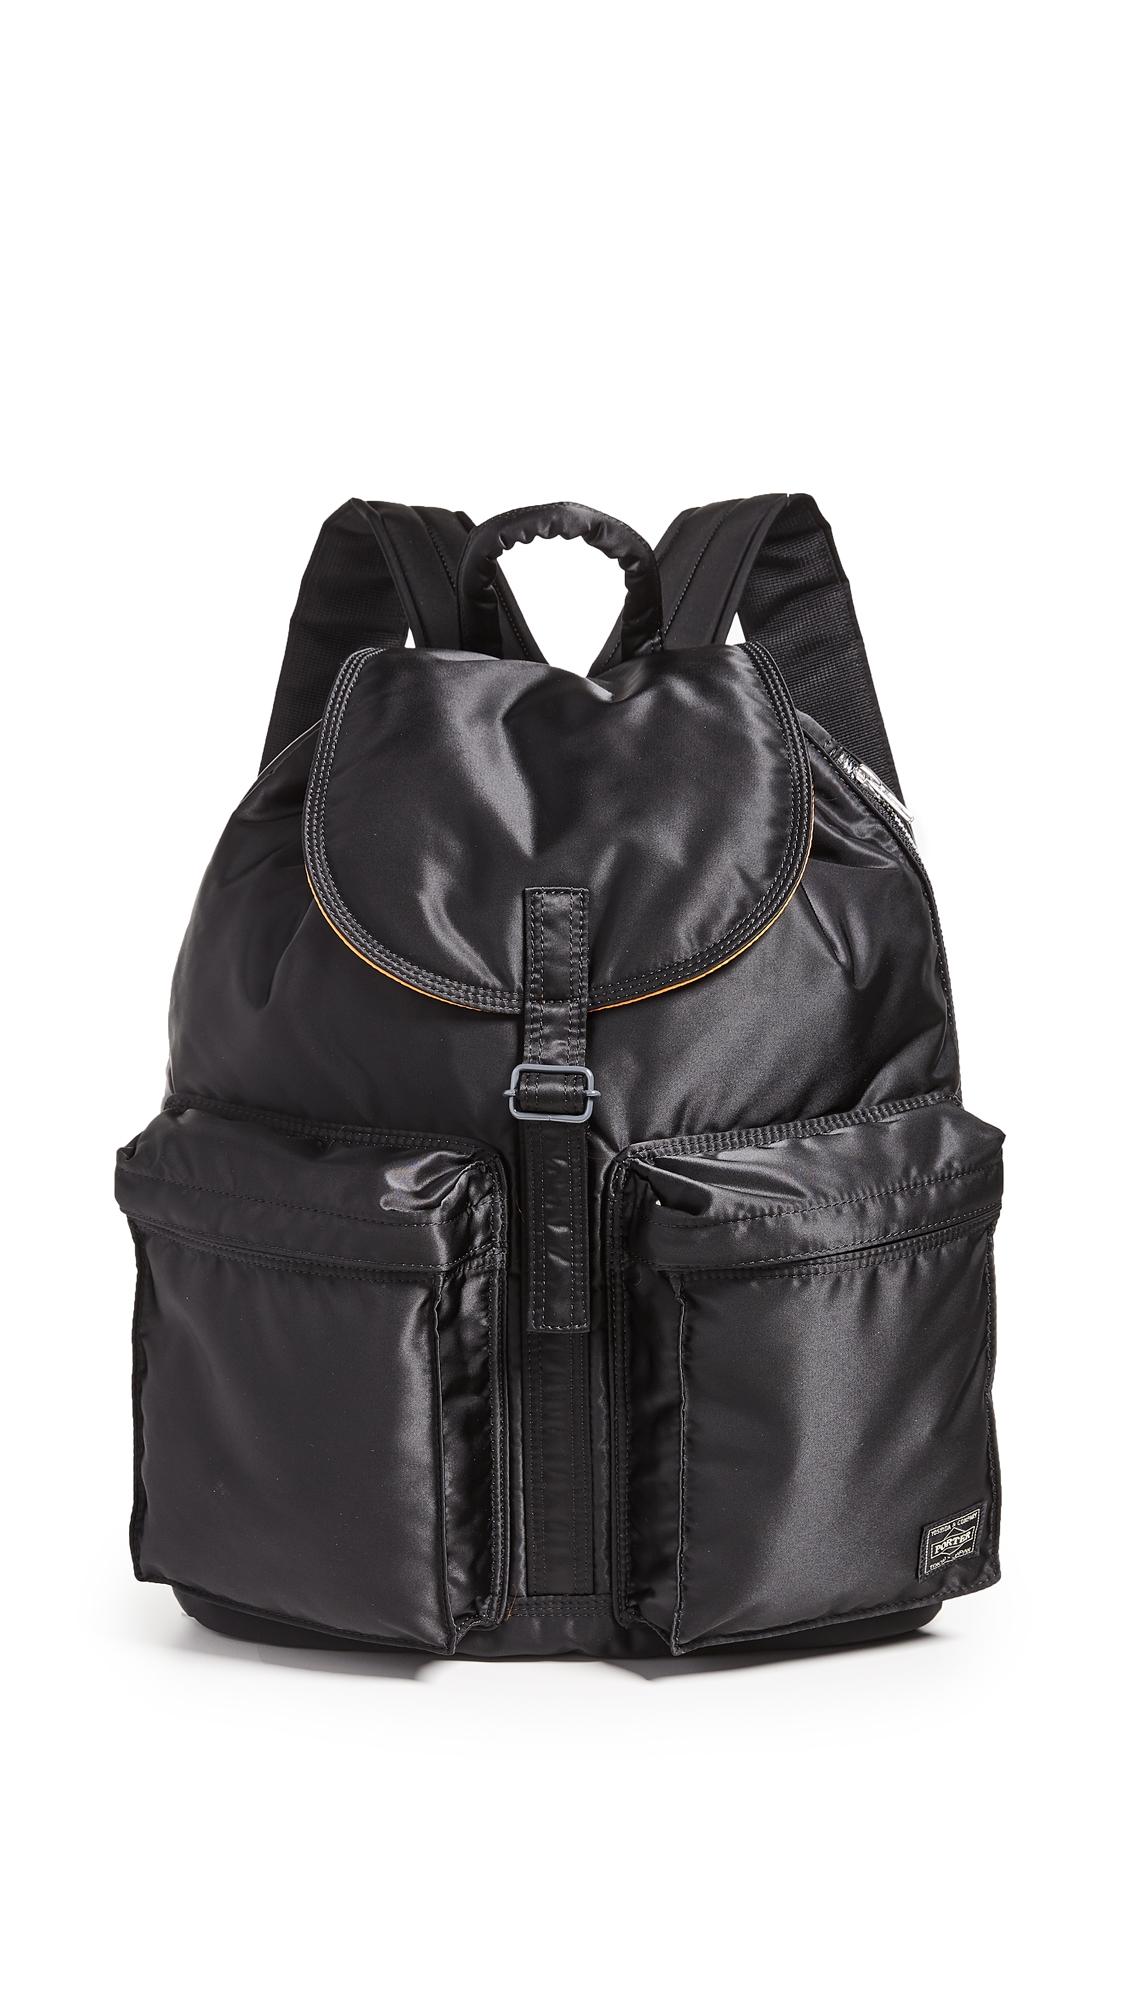 PORTER Tanker Rucksack Backpack in Black